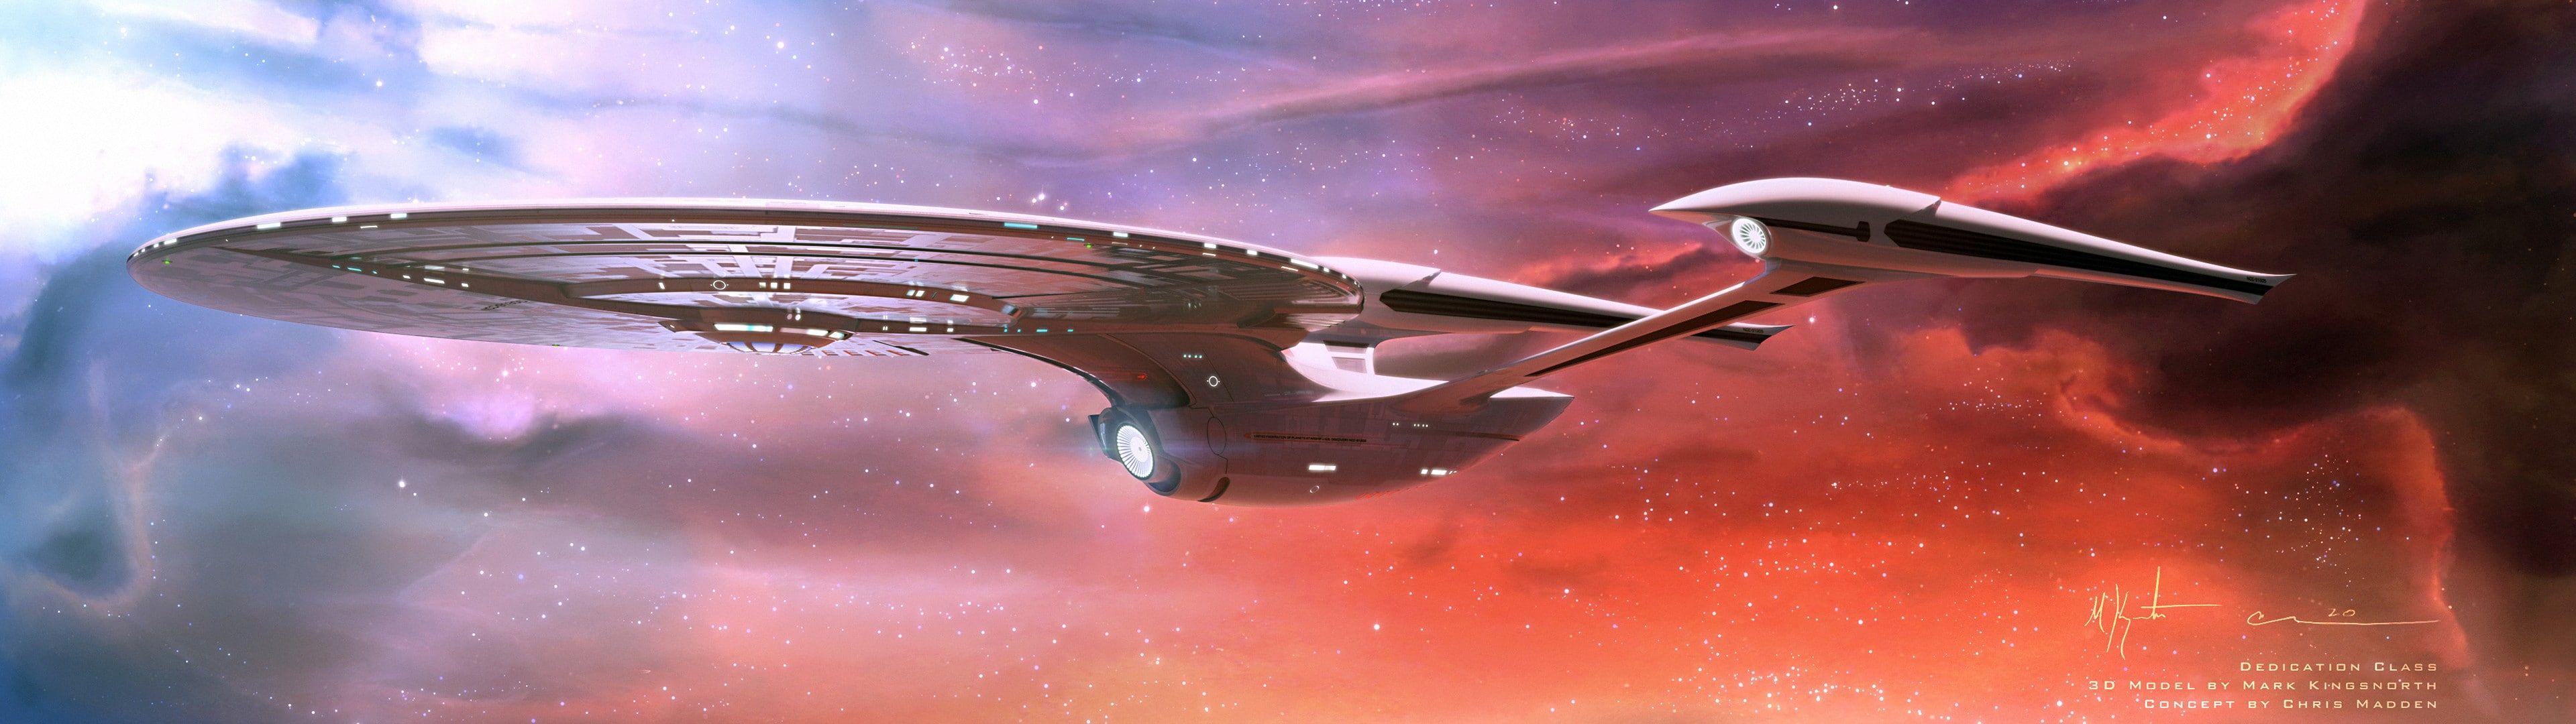 Uss Enterprise Spaceship Nebula Dual Monitors Space Star Trek Multiple Display 4k Wallpaper Hdwallpape In 2020 Star Trek Starships Uss Enterprise Star Trek Trek